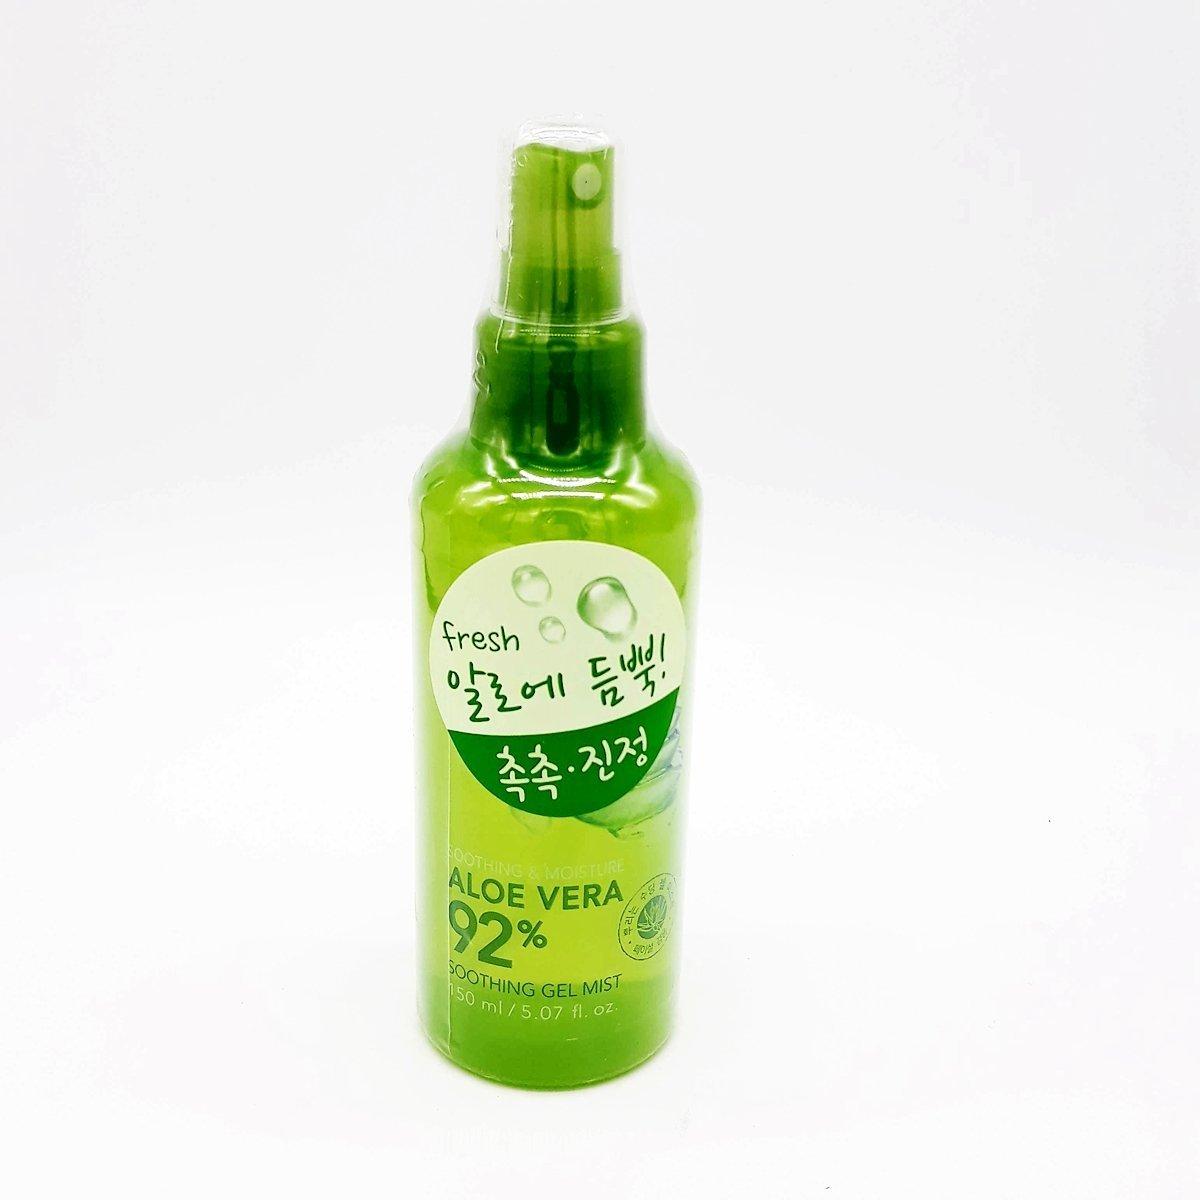 Nature Republic New Soothing Moisture Aloe Vera 92 Gel Mist 150ml